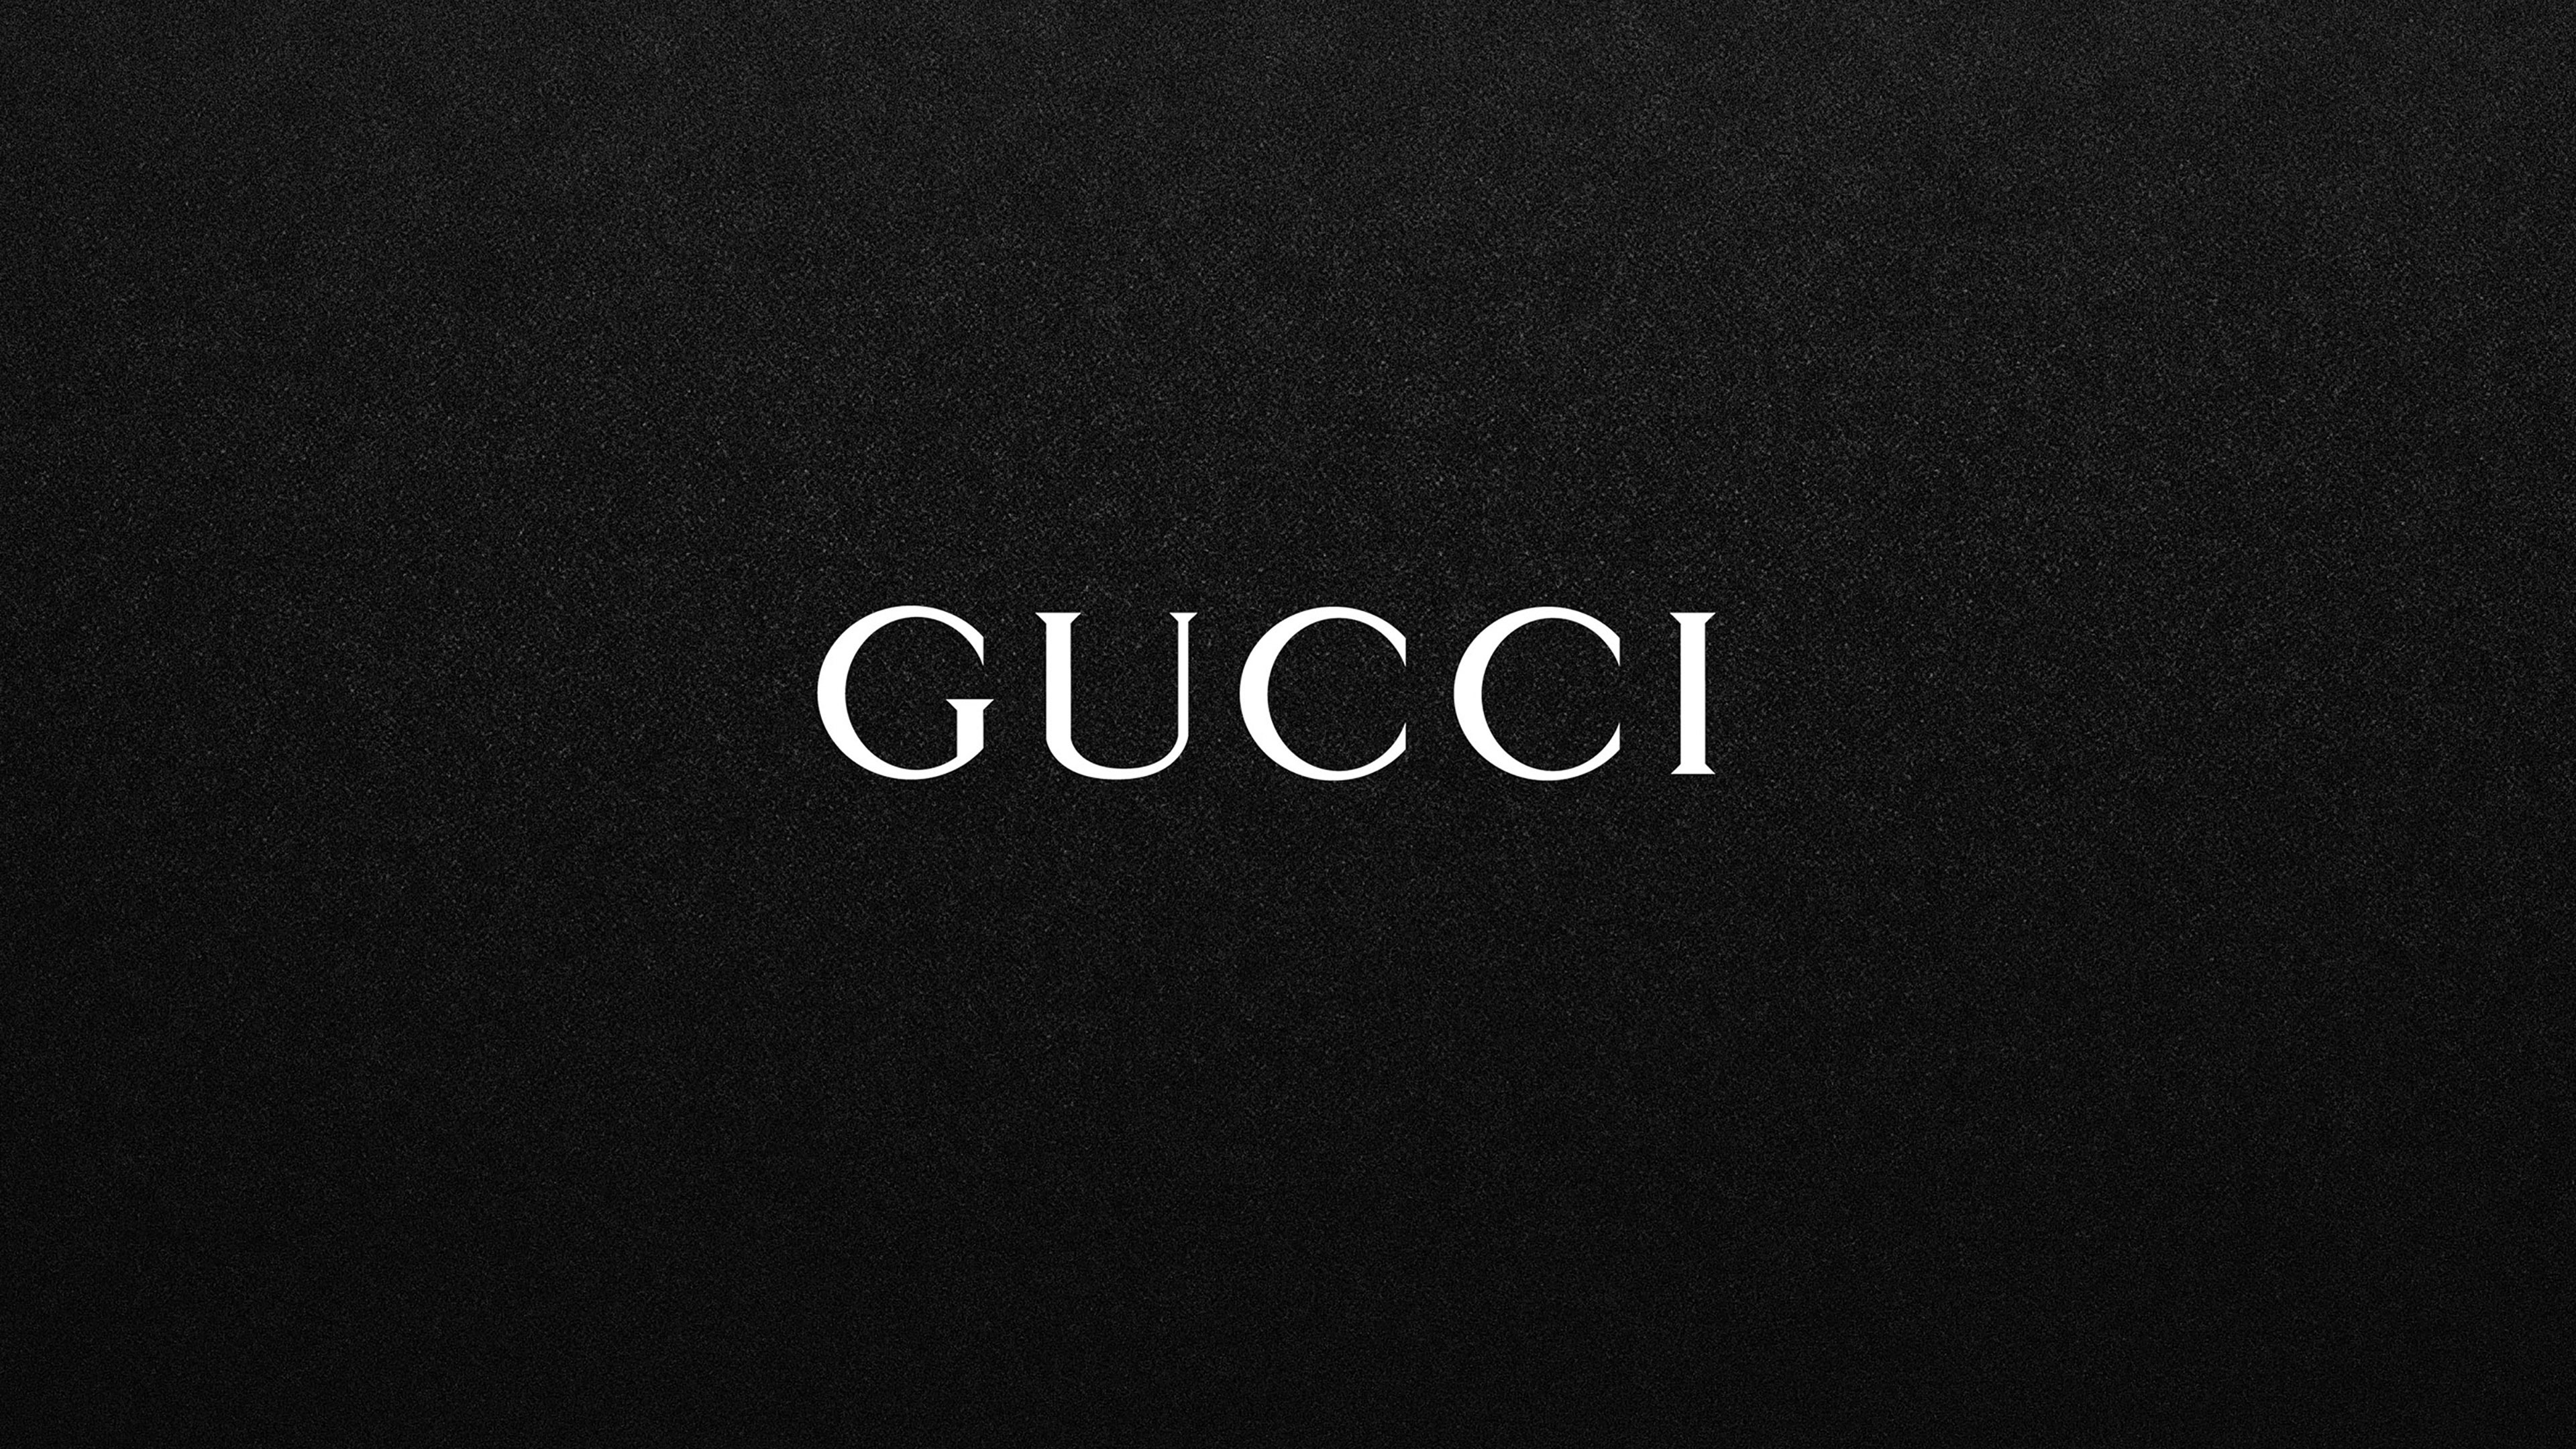 Animated Wallpaper Iphone Download Gucci Logo Wallpapers Hd Pixelstalk Net